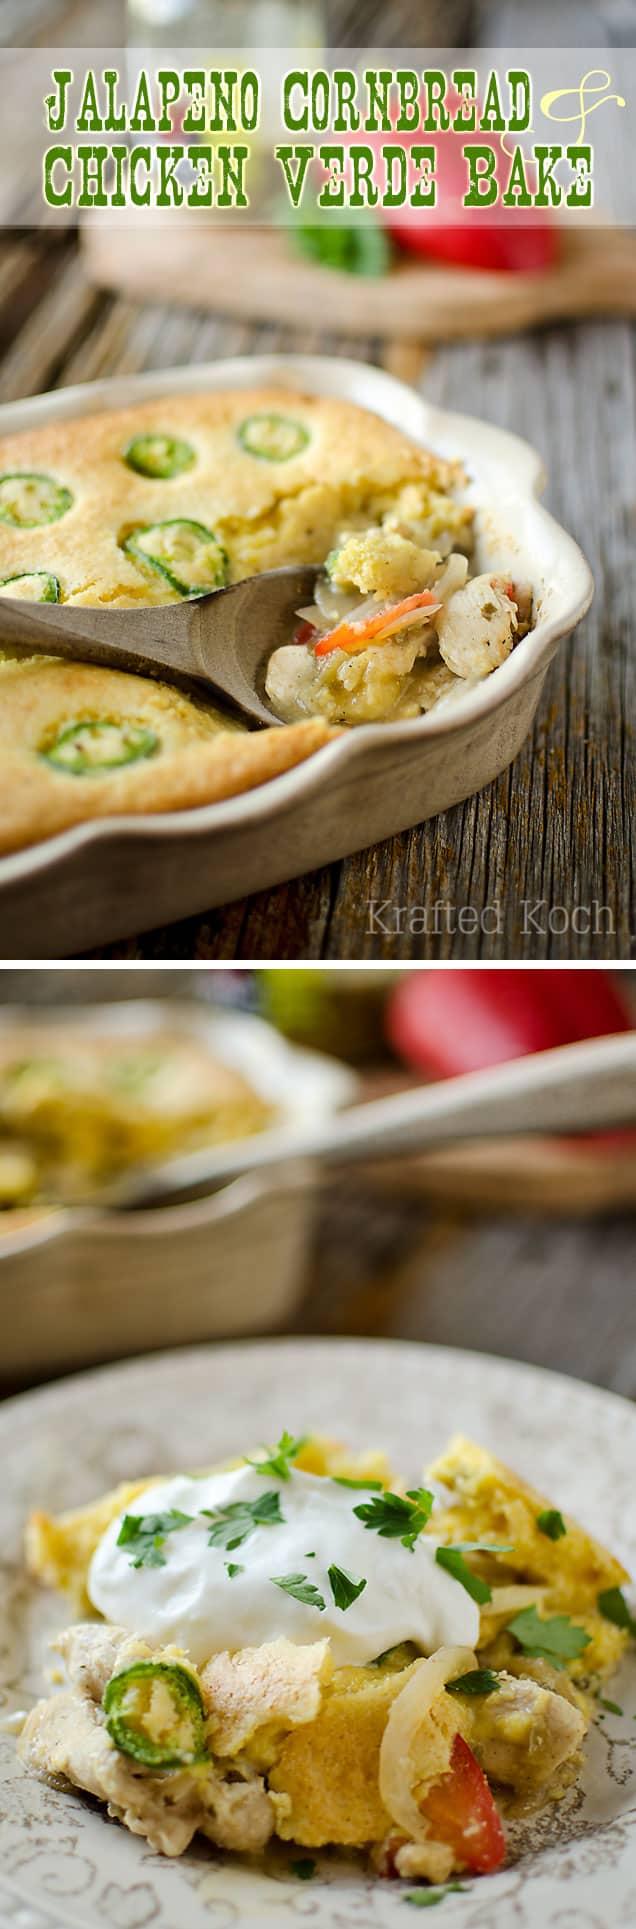 Jalapeno Cornbread & Chicken Verde Bake - Krafted Koch